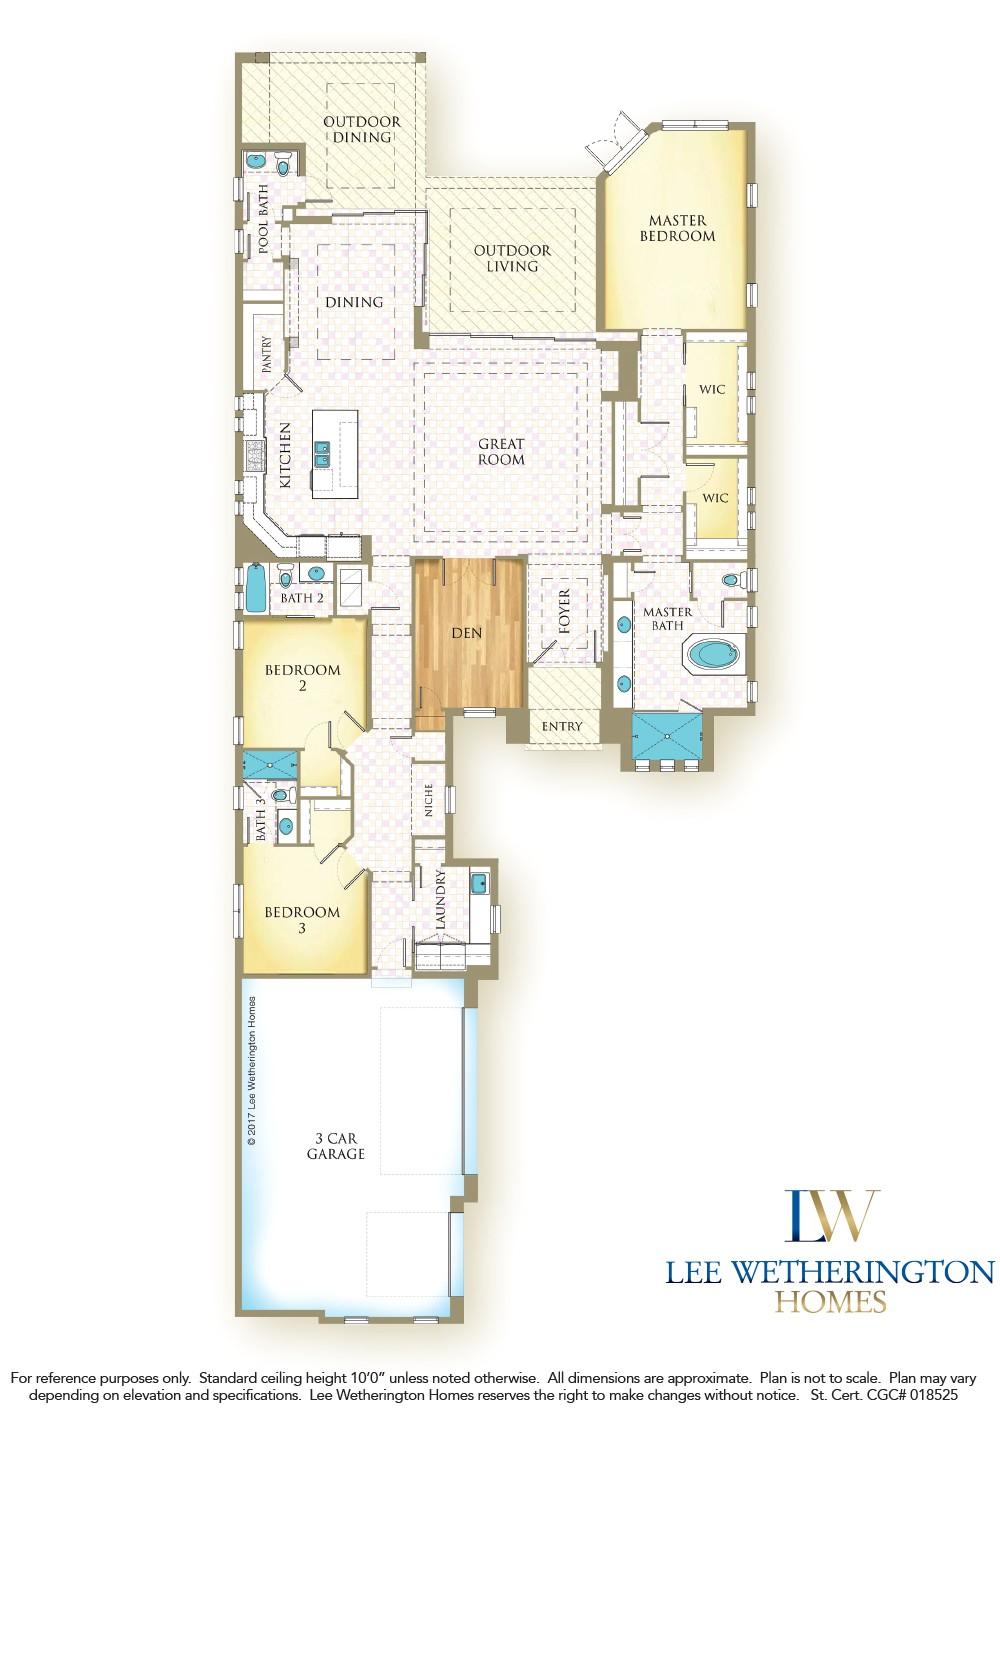 index option com k2 view item id 222 san mateo at matera in the lake club at lakewood ranch by lee wetherington homes 65 itemid 890